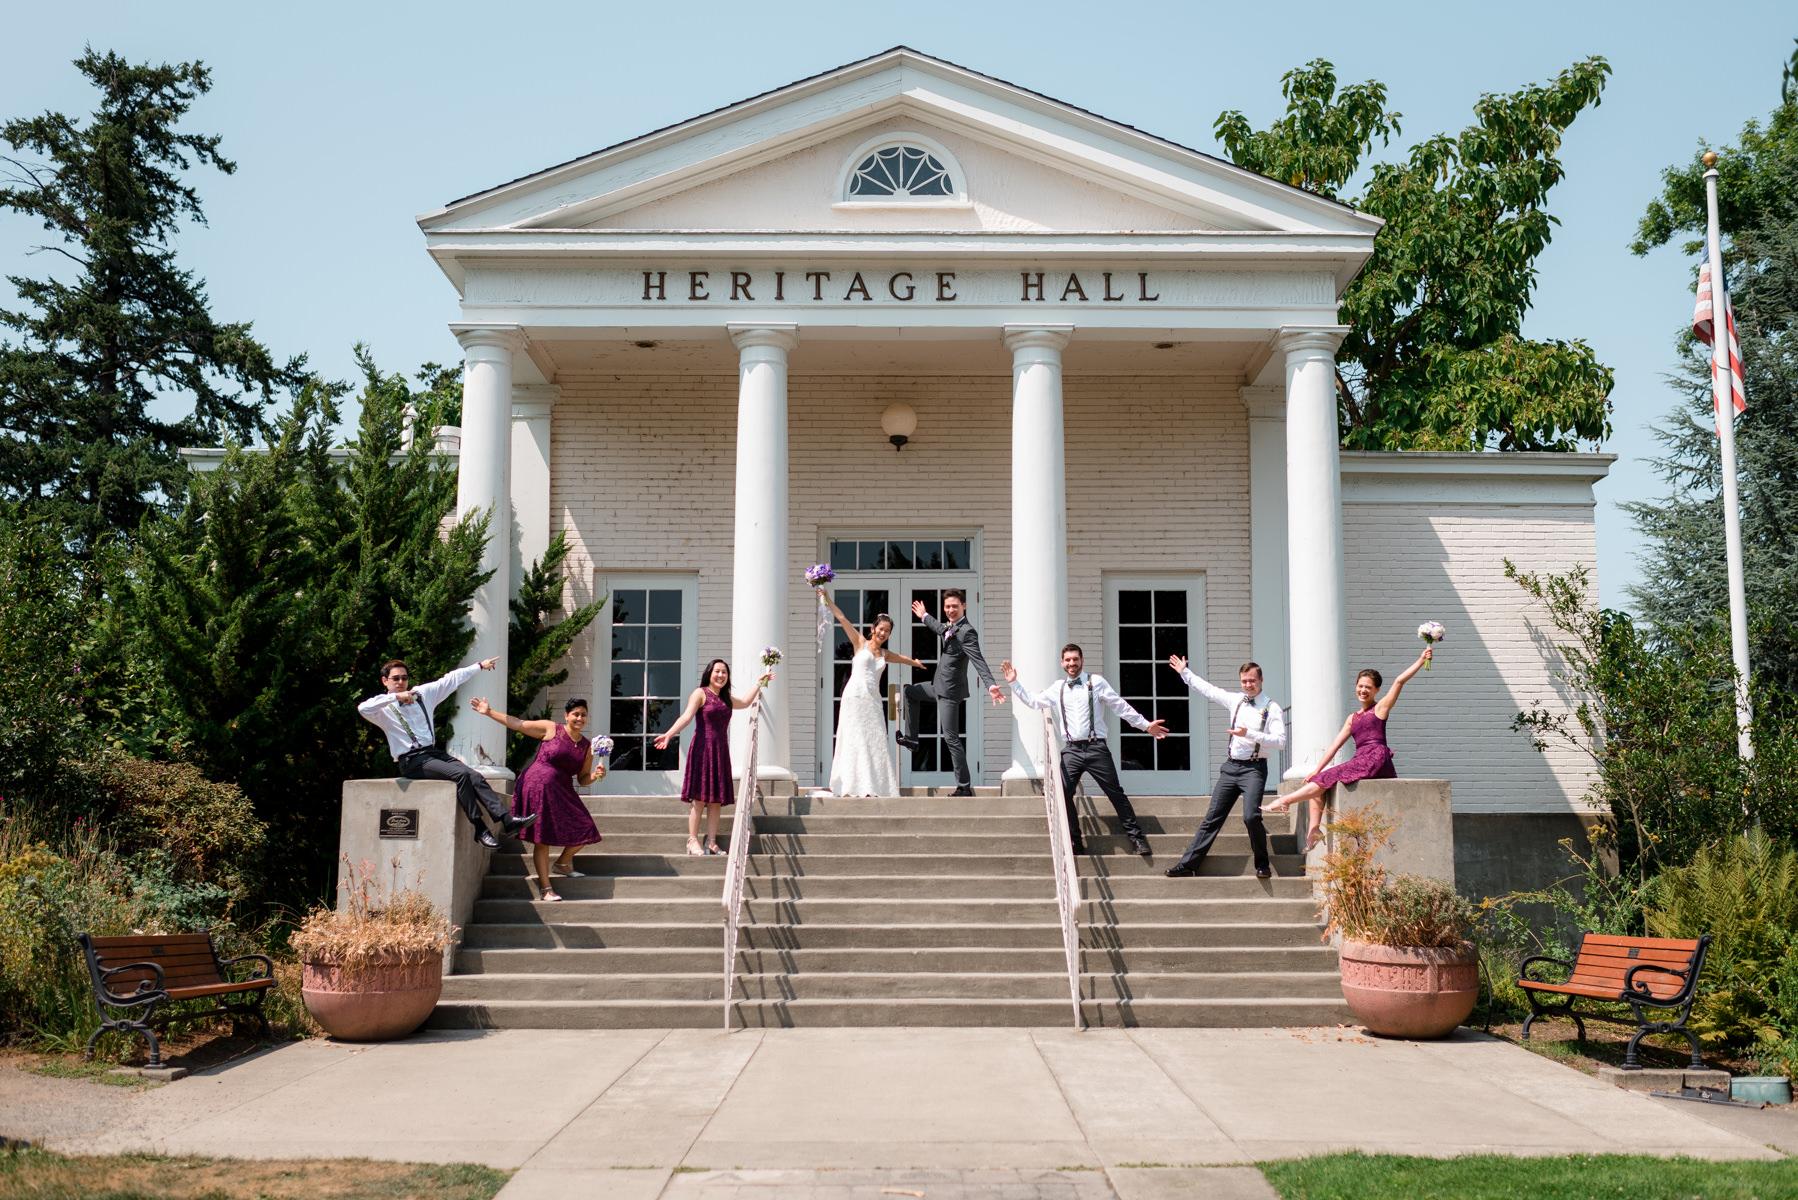 Andrew Tat - Documentary Wedding Photography - Heritage Hall - Kirkland, Washington - Grace & James - 11.JPG